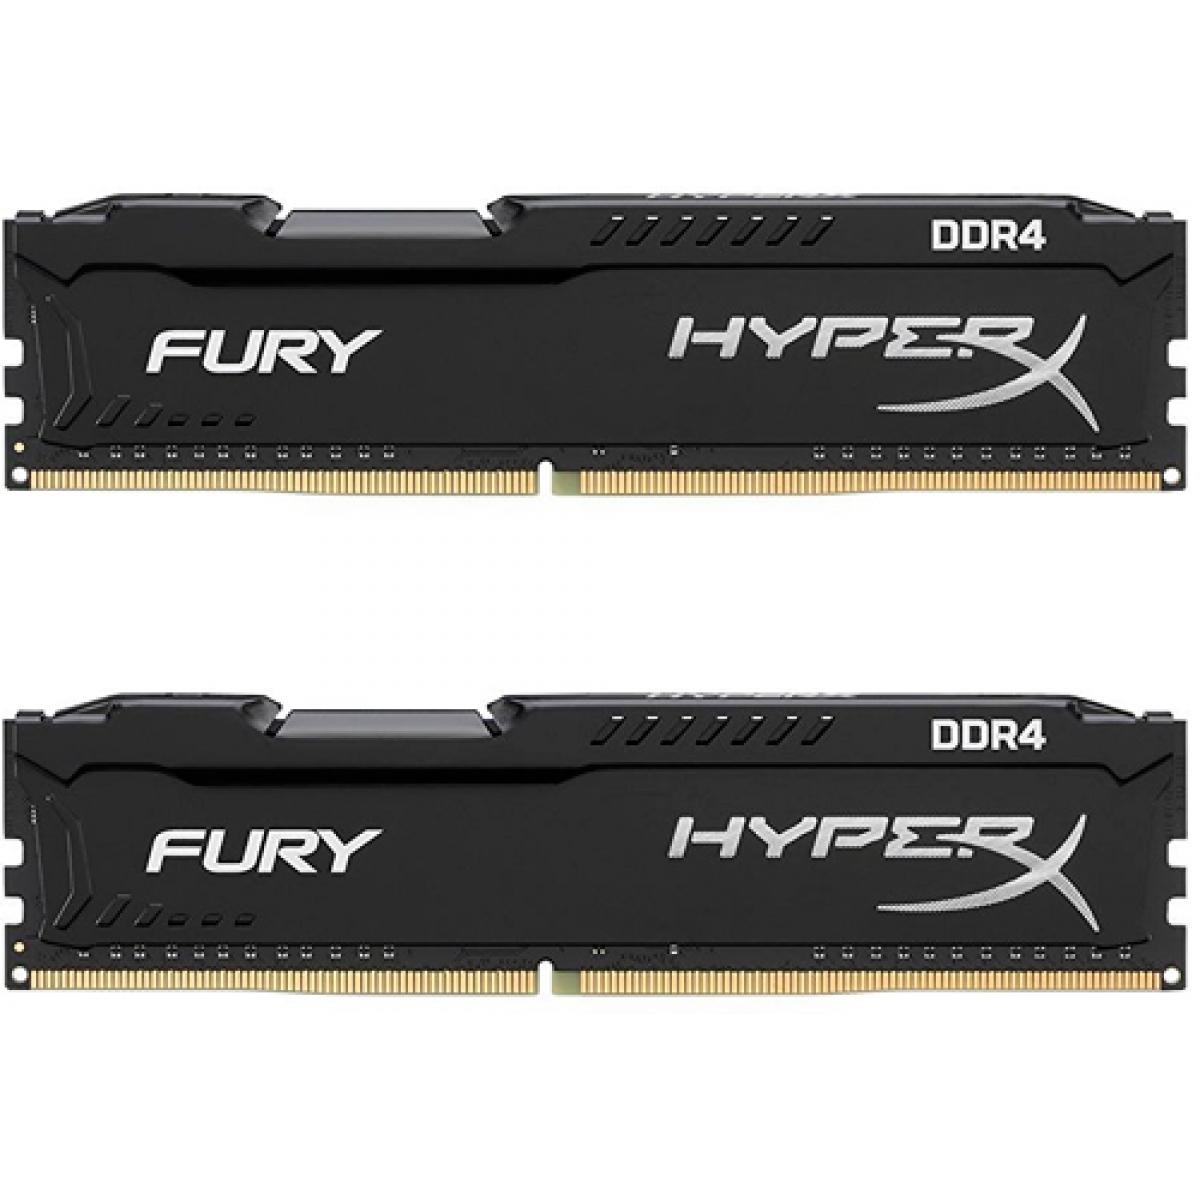 Memória DDR4 Kingston Hyperx Fury, 32GB (2X16GB) 2666MHz, HX426C16FBK2/32